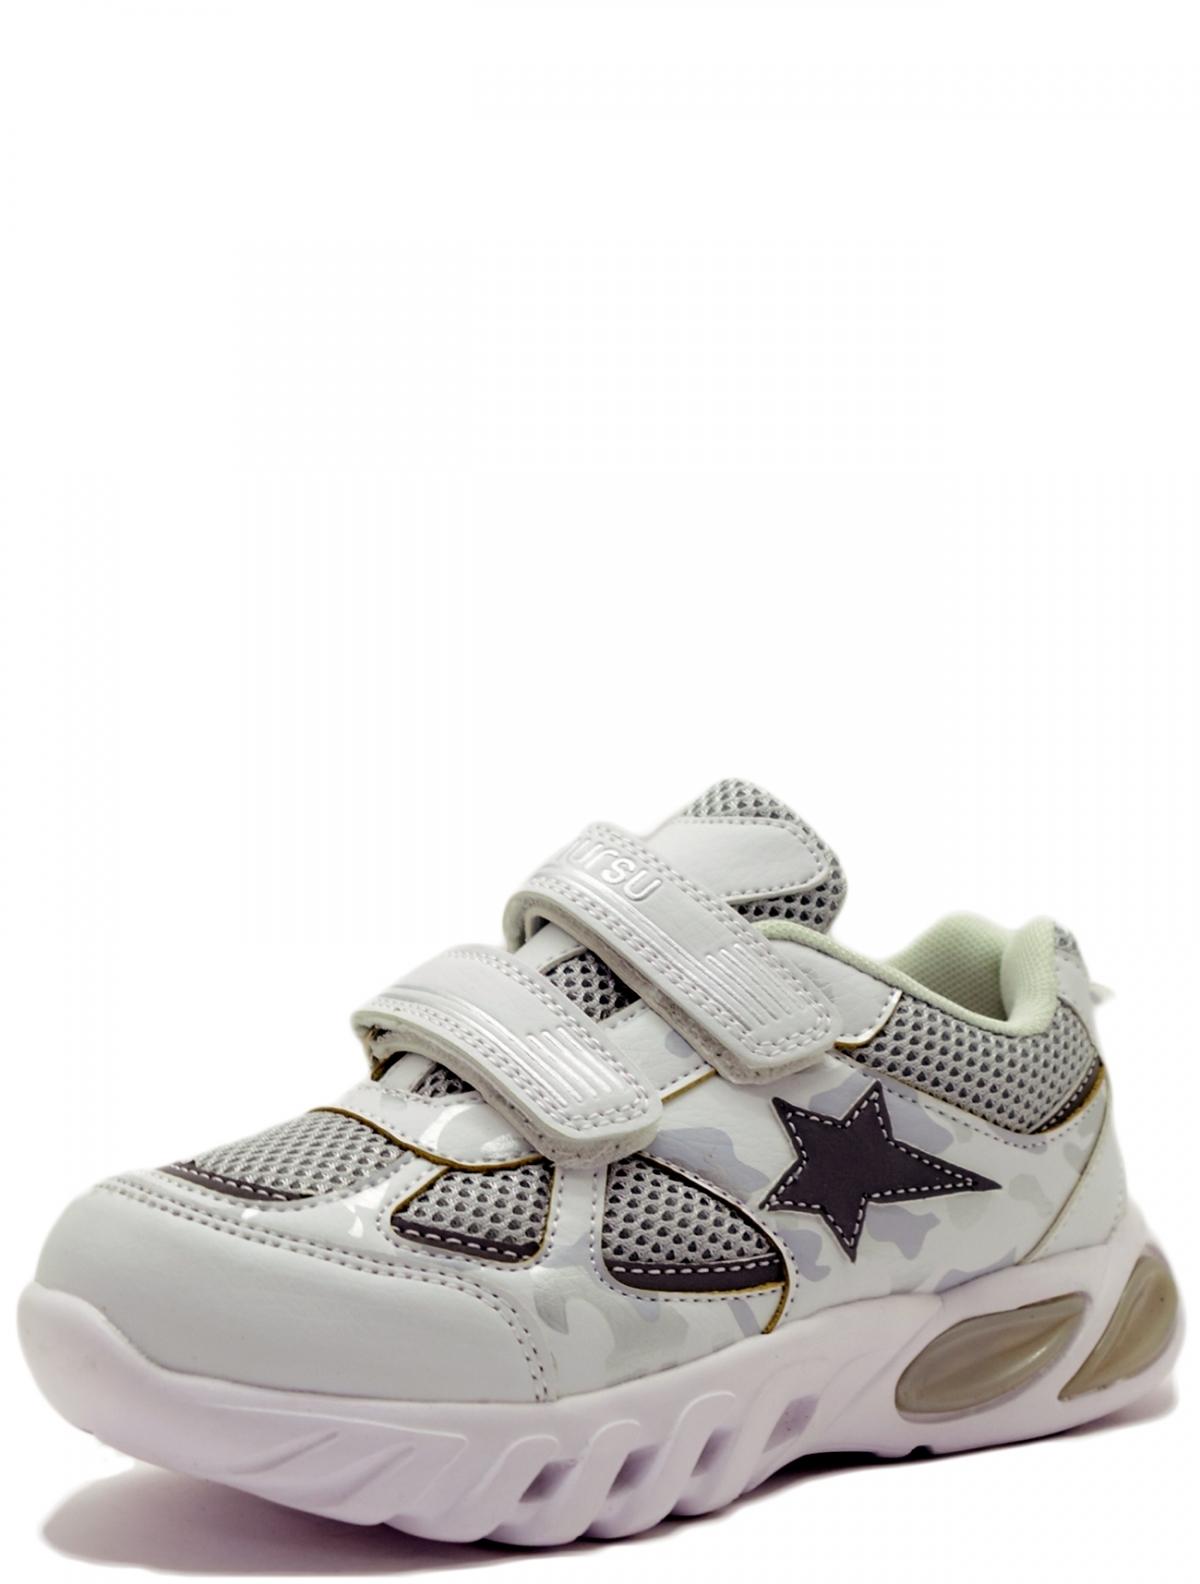 Mursu 215010 кроссовки для девочки